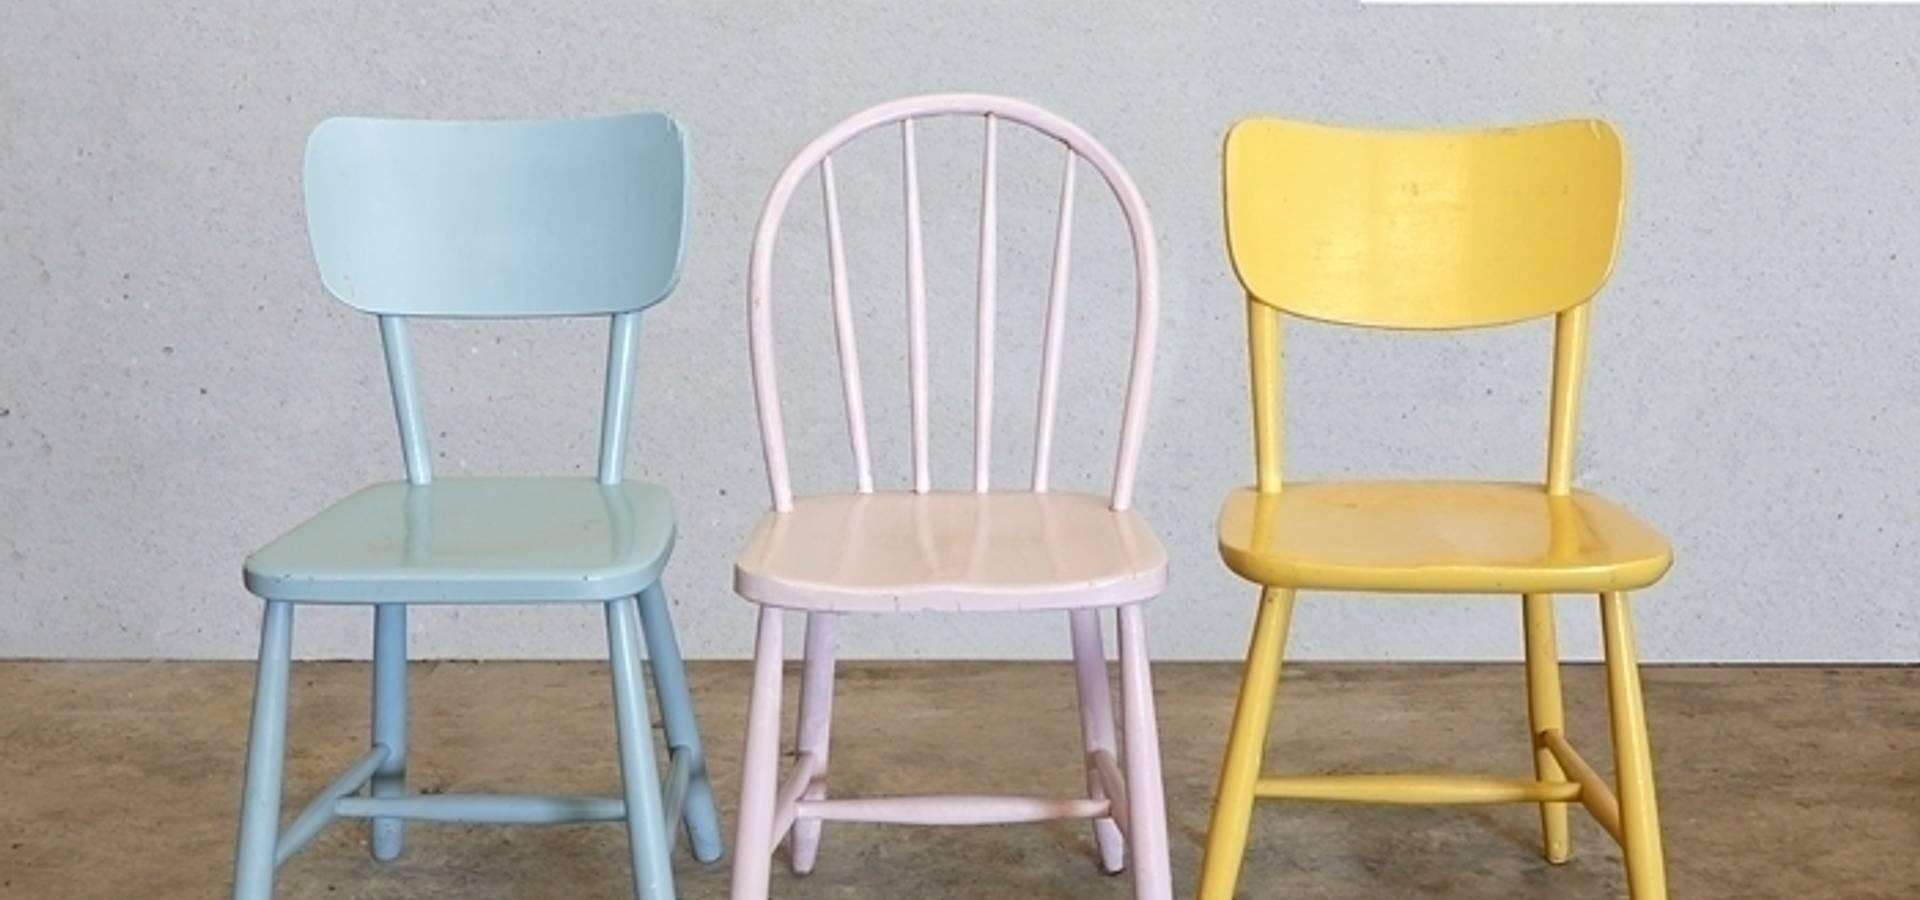 Gidlööf mobles escandinaus vintage